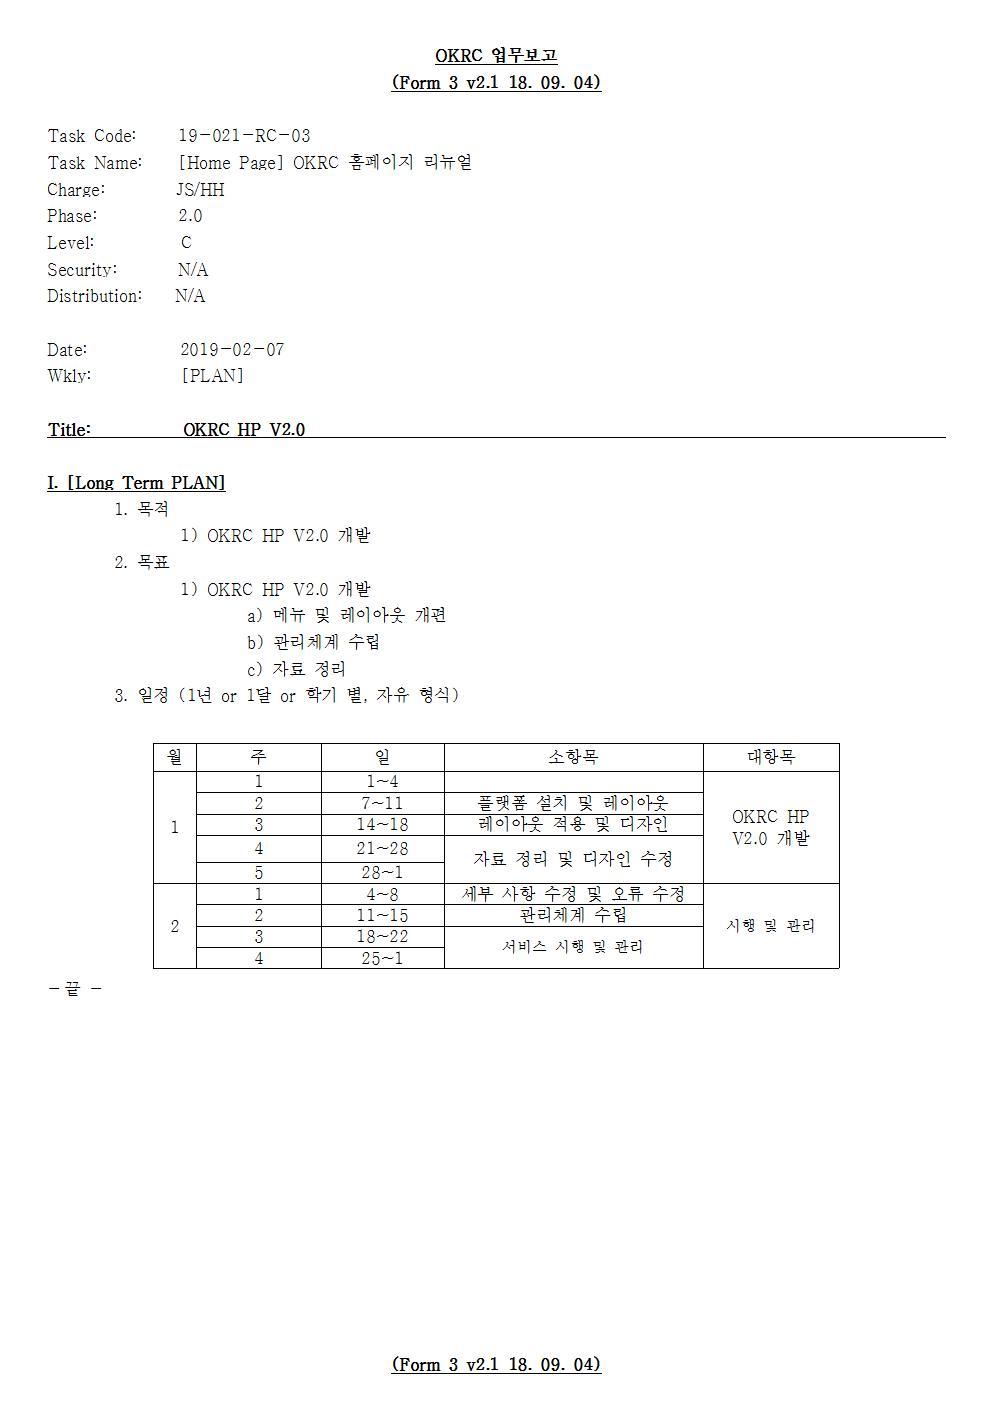 D-[19-021-RC-03]-[OKRCHP V2.0]-[2019-02-07][HH]001.jpg